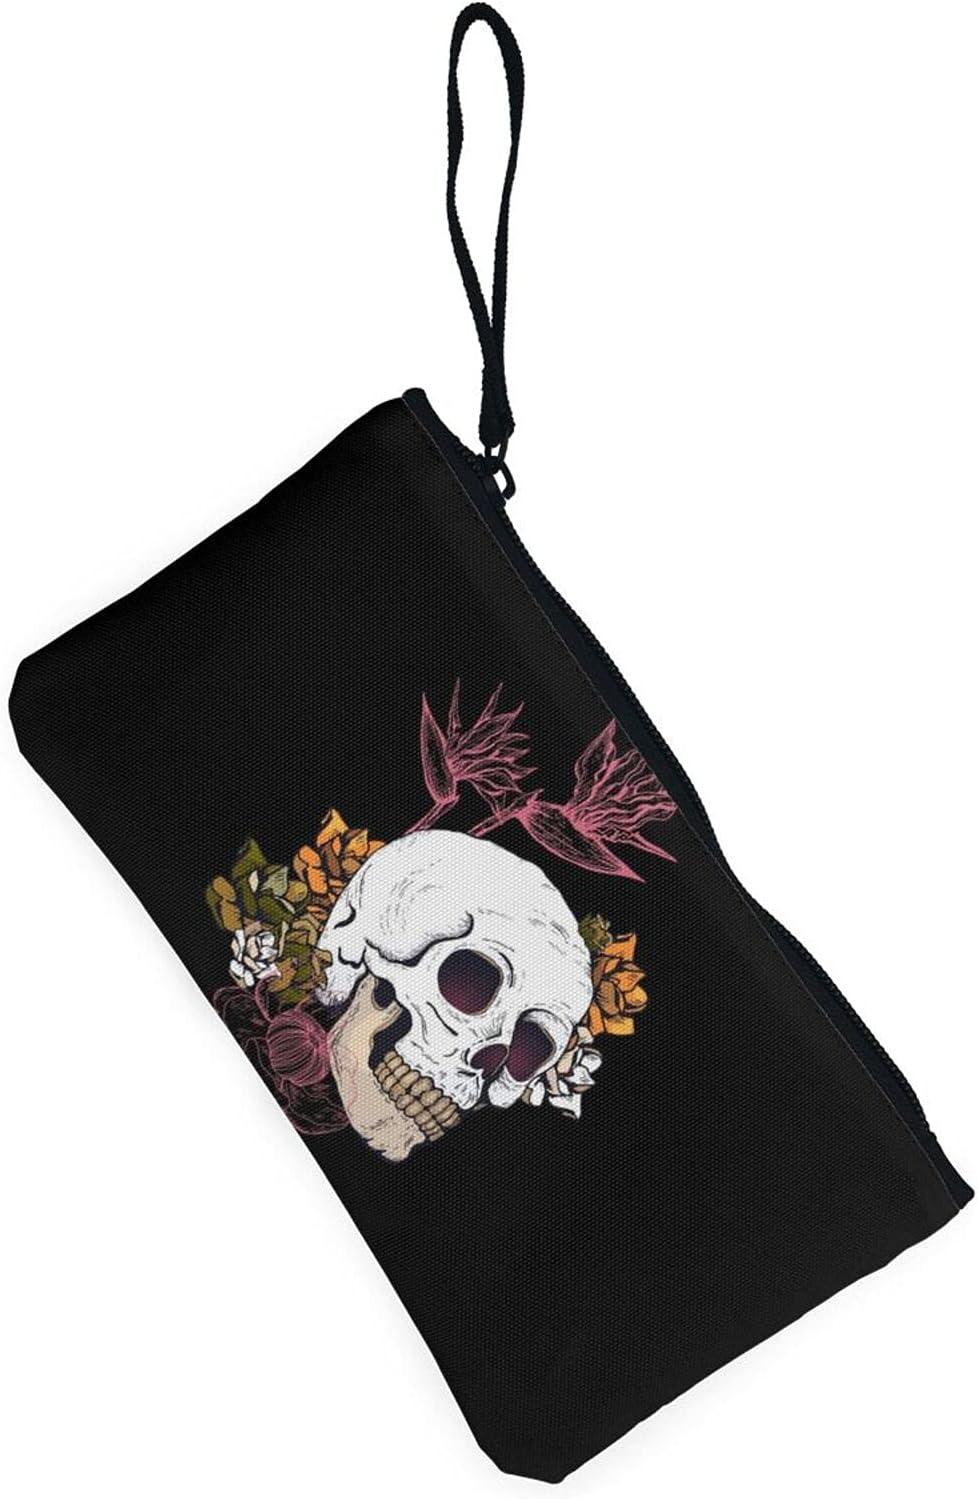 AORRUAM Floral Skull Canvas Coin Purse,Canvas Zipper Pencil Cases,Canvas Change Purse Pouch Mini Wallet Coin Bag